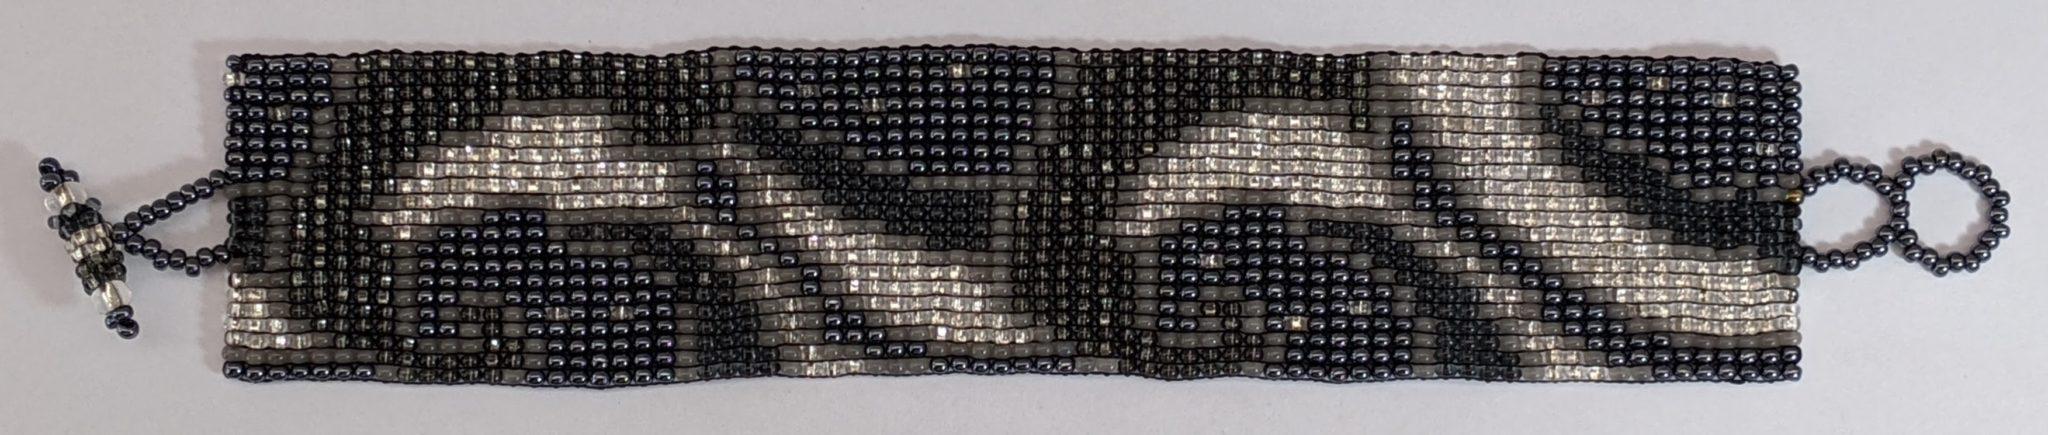 Art Nouveau Beaded Bracelet - Medium Grays